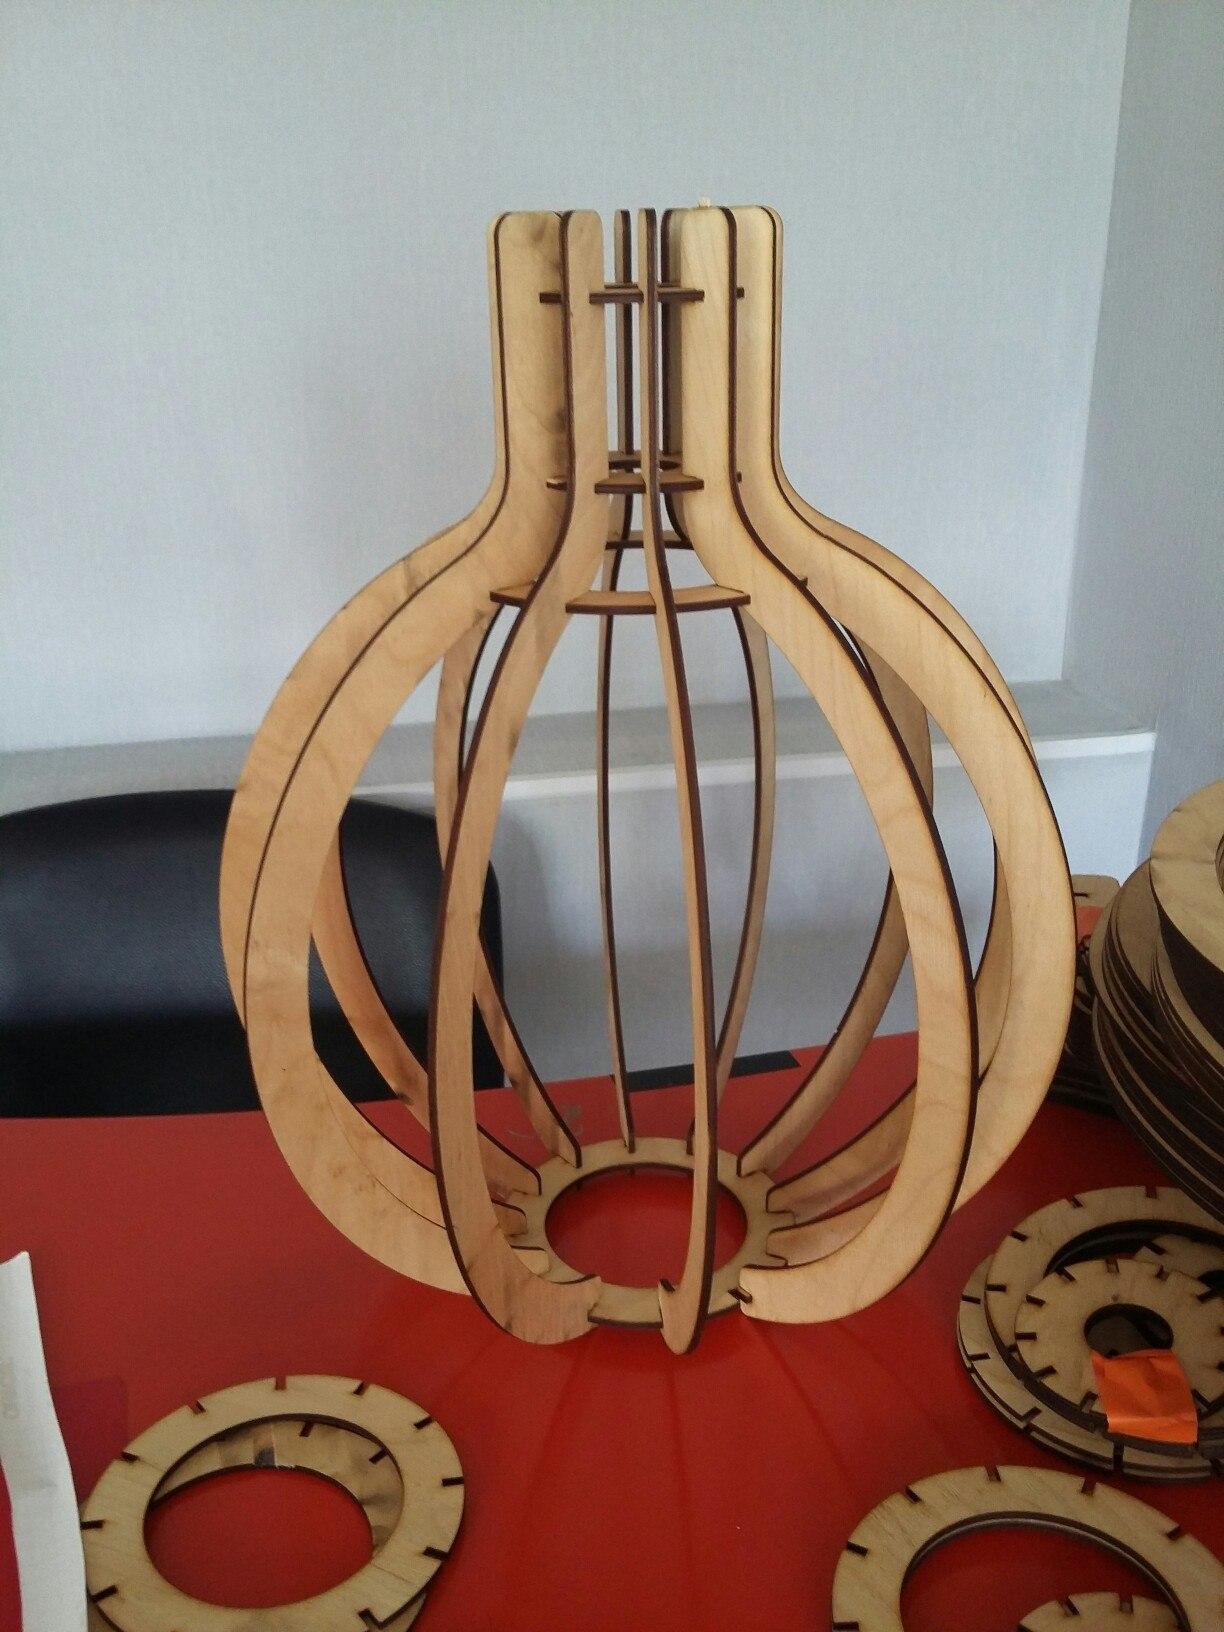 Lampa Lampochka For Laser Cut Free CDR Vectors Art